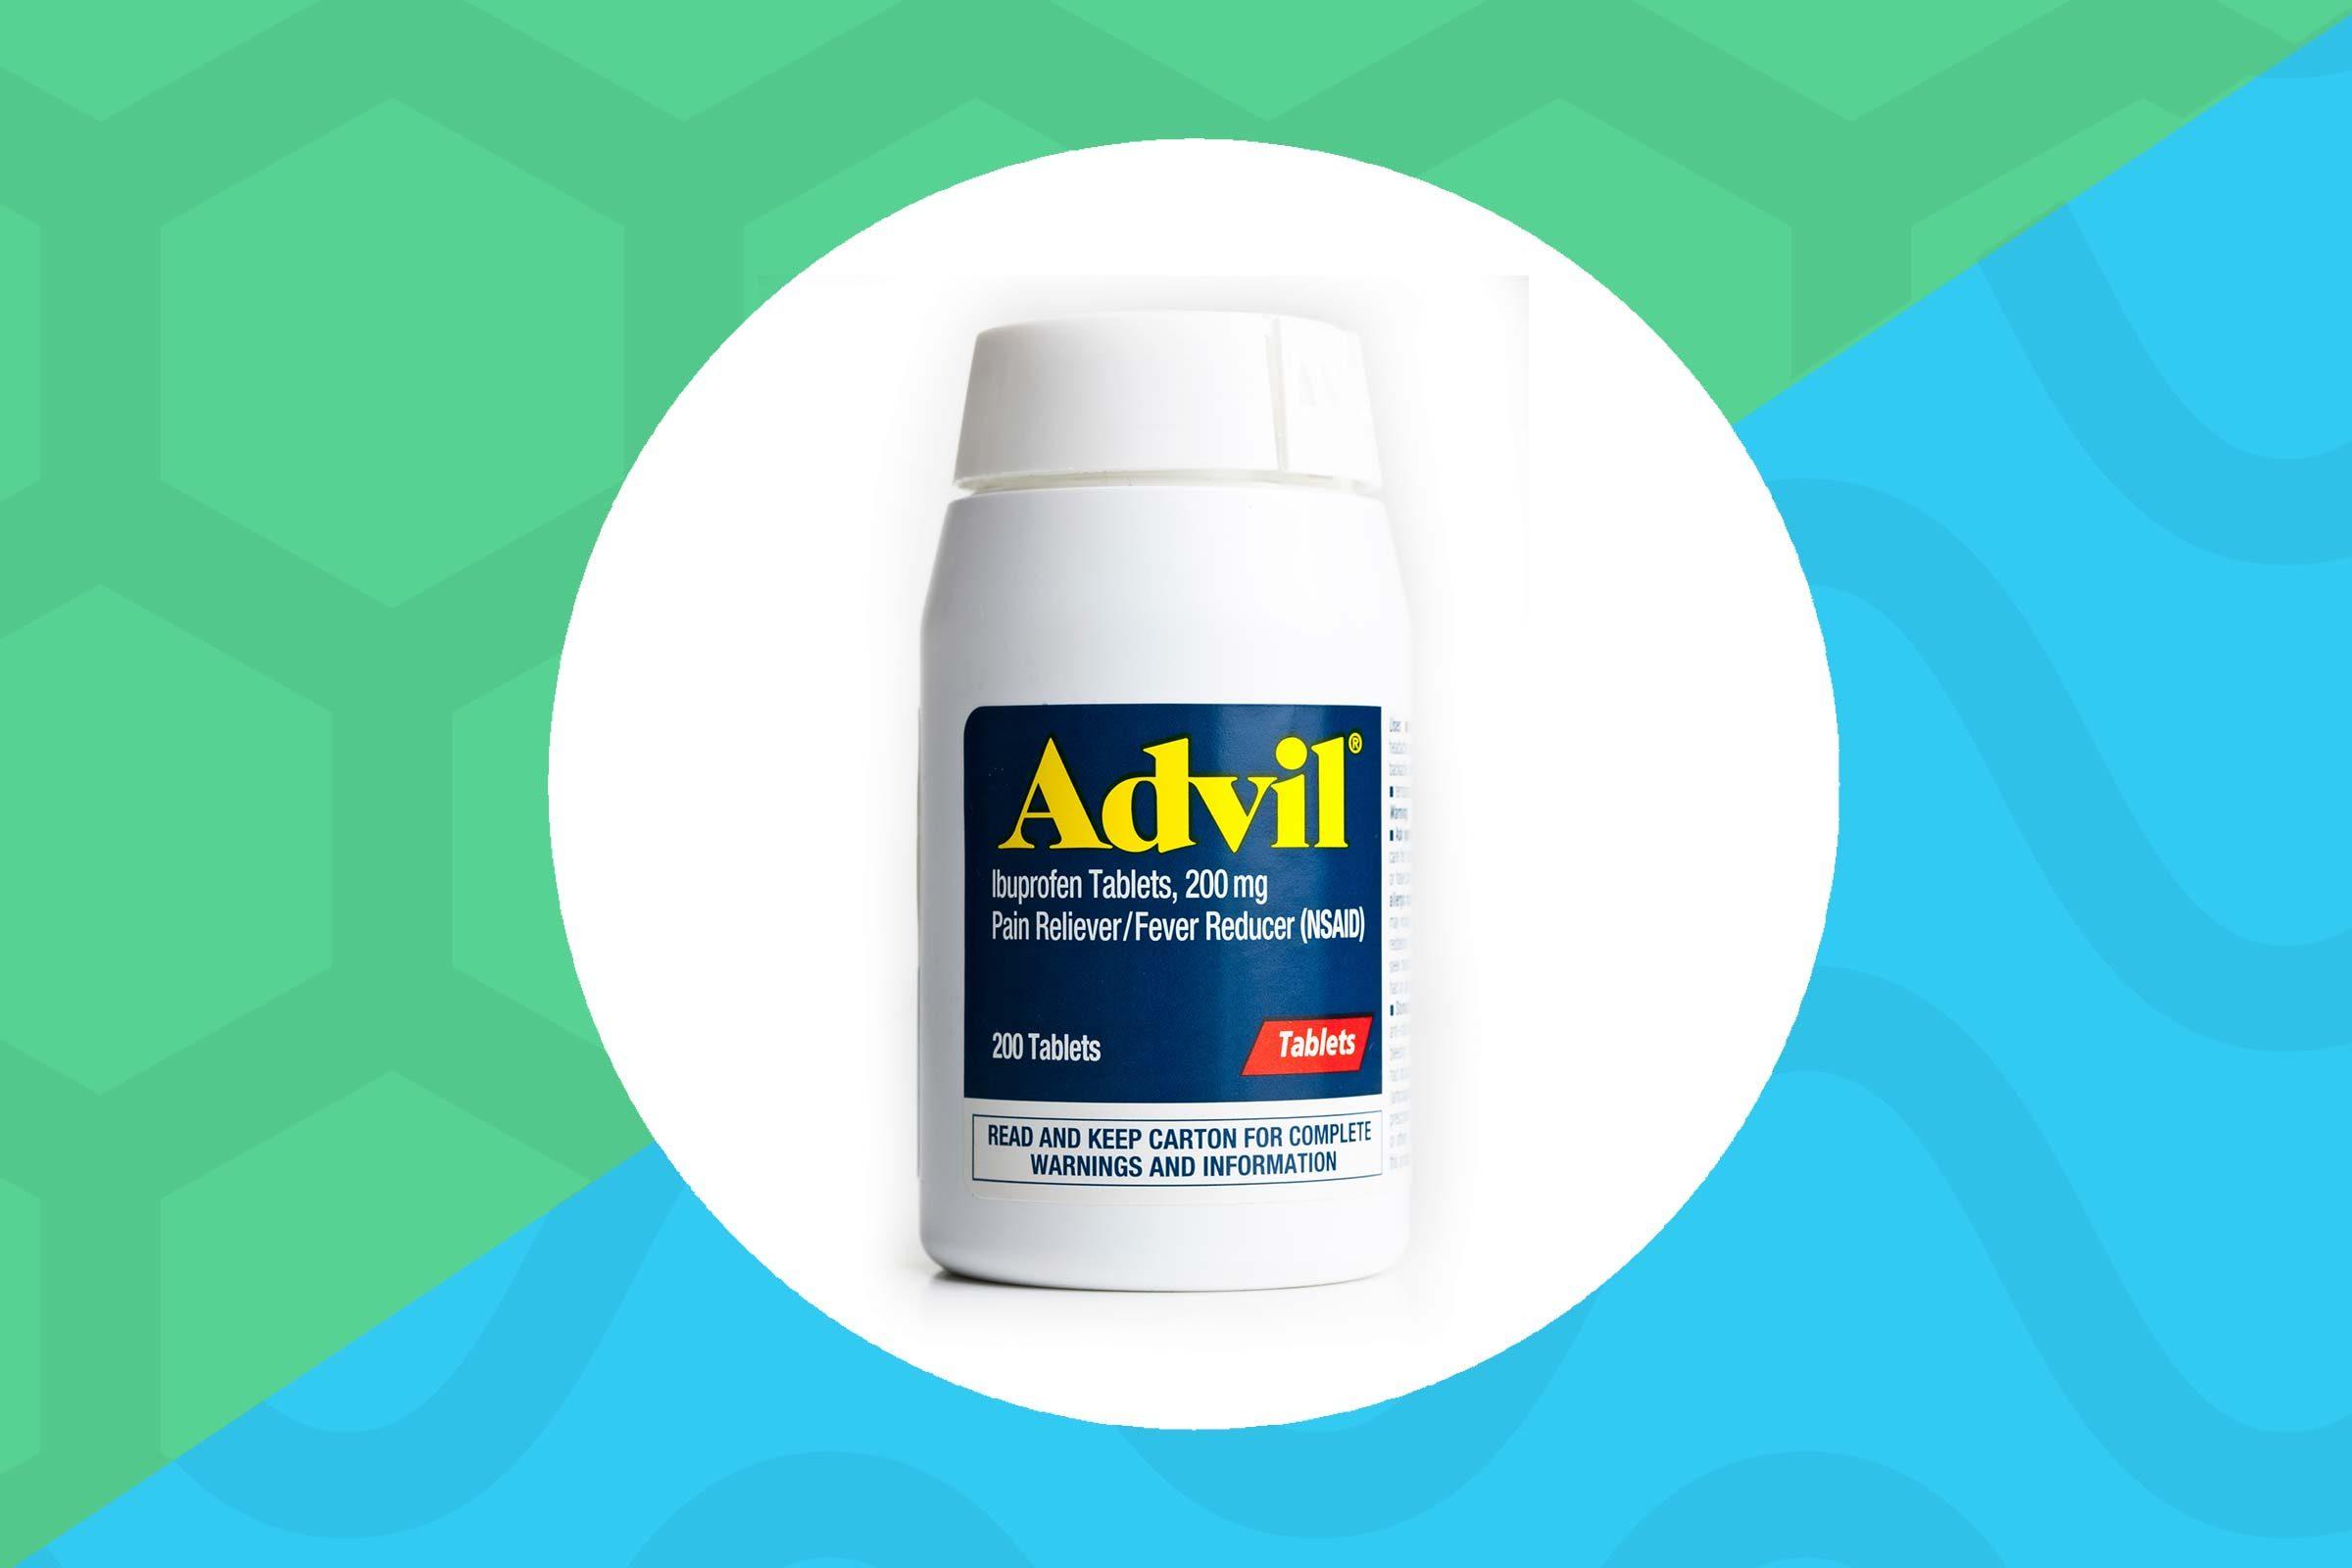 Home Remedies for Sinus Headaches | Reader's Digest